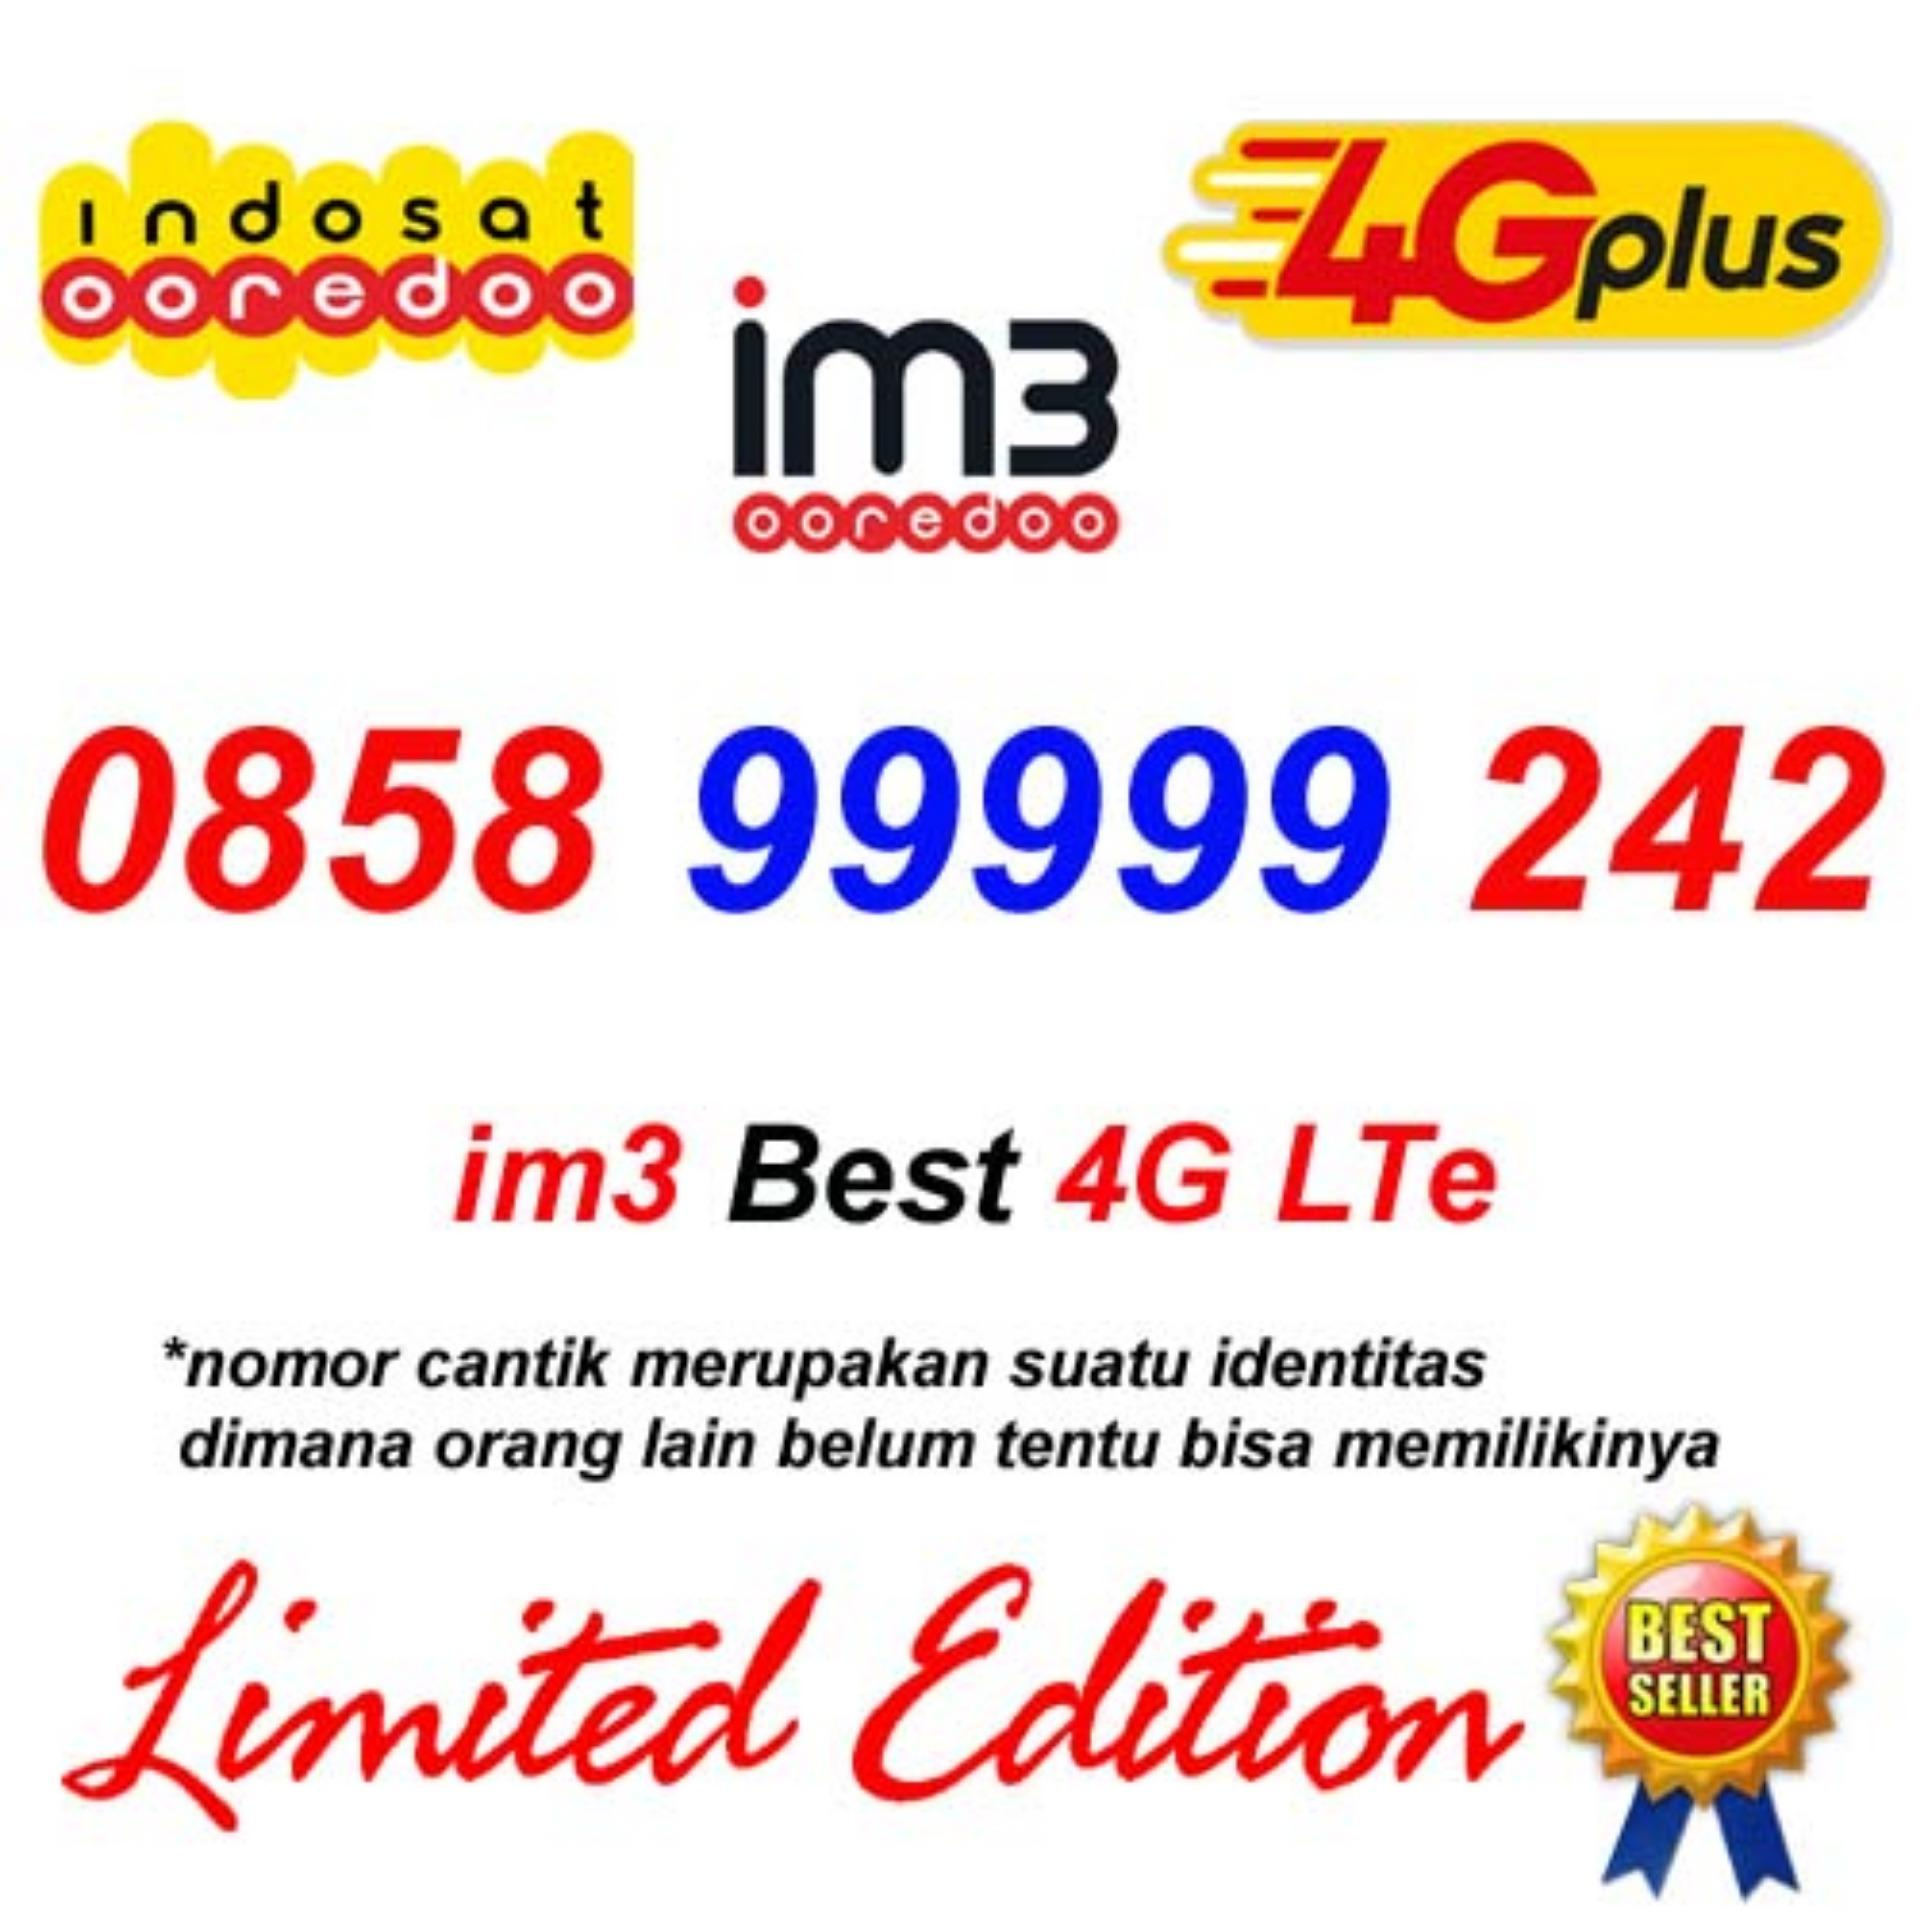 Jual Produk Indosat Terlengkap Voucher 2 Gb Mini Im3 Ooredoo 0858 99999 242 Kartu Perdana Nomor Cantik 4g Lte Plus